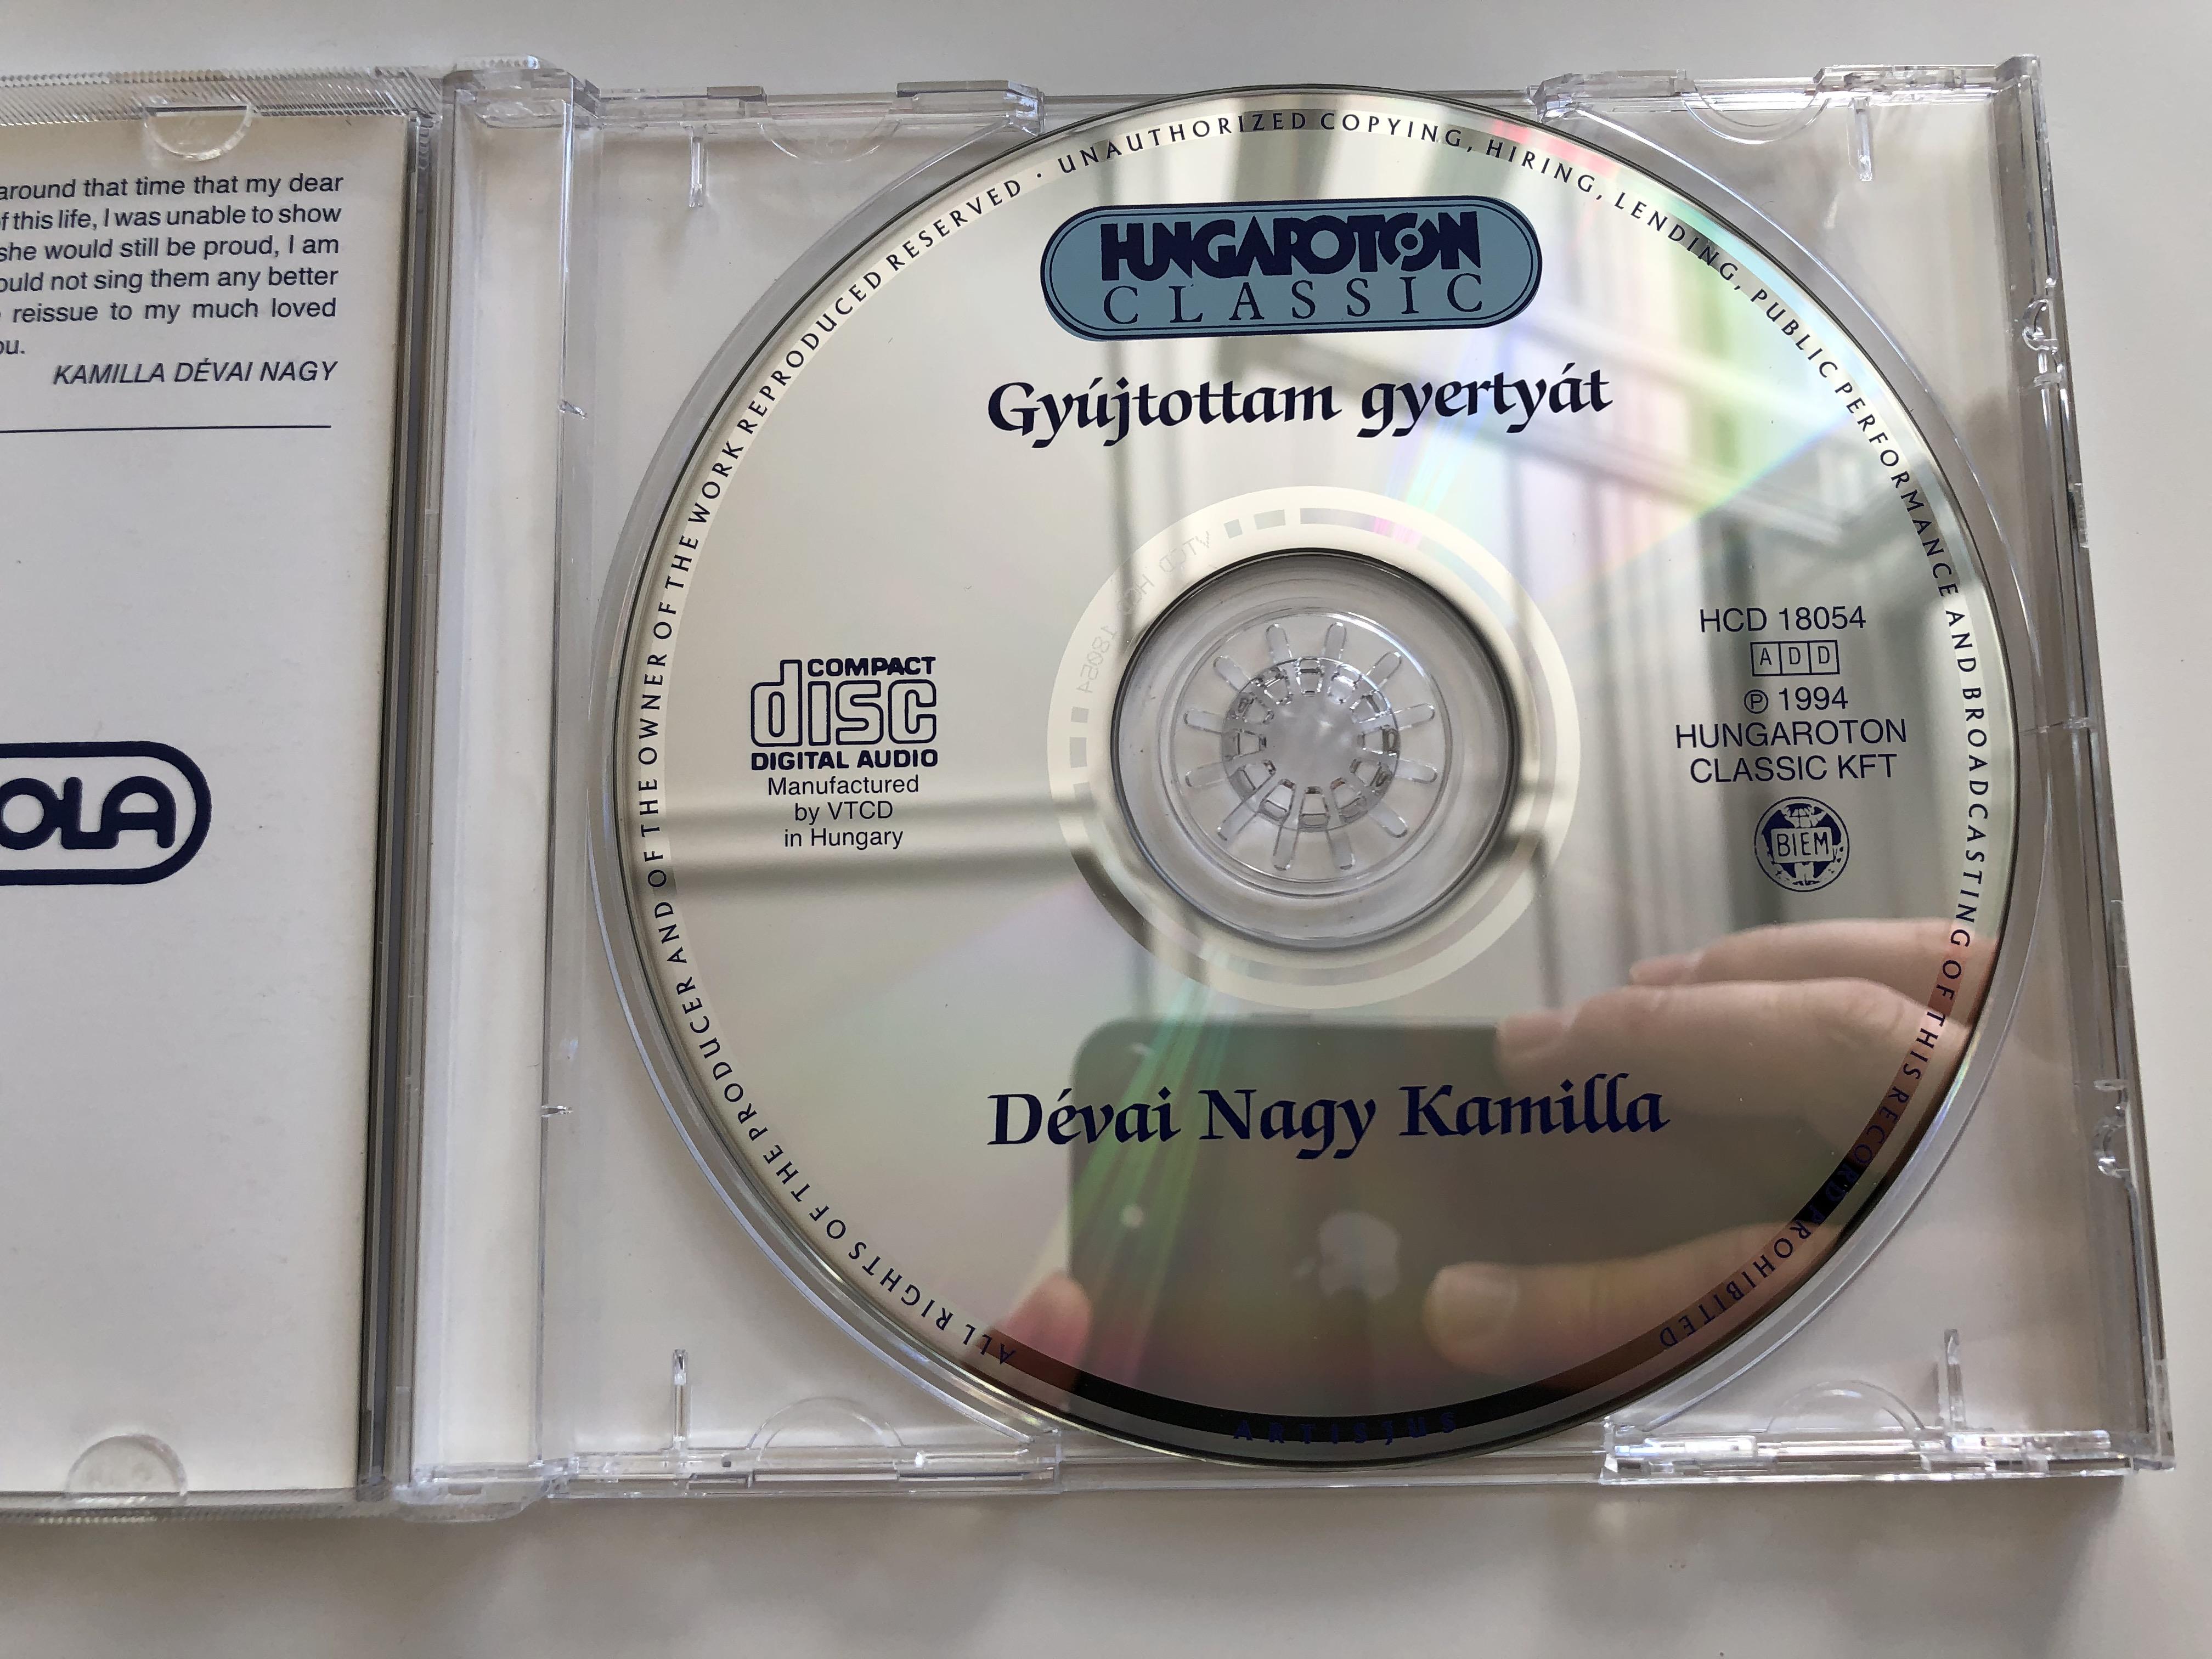 gy-jtottam-gyerty-t-d-vai-nagy-kamilla-hungaroton-classic-audio-cd-1994-stereo-hcd-18054-7-.jpg